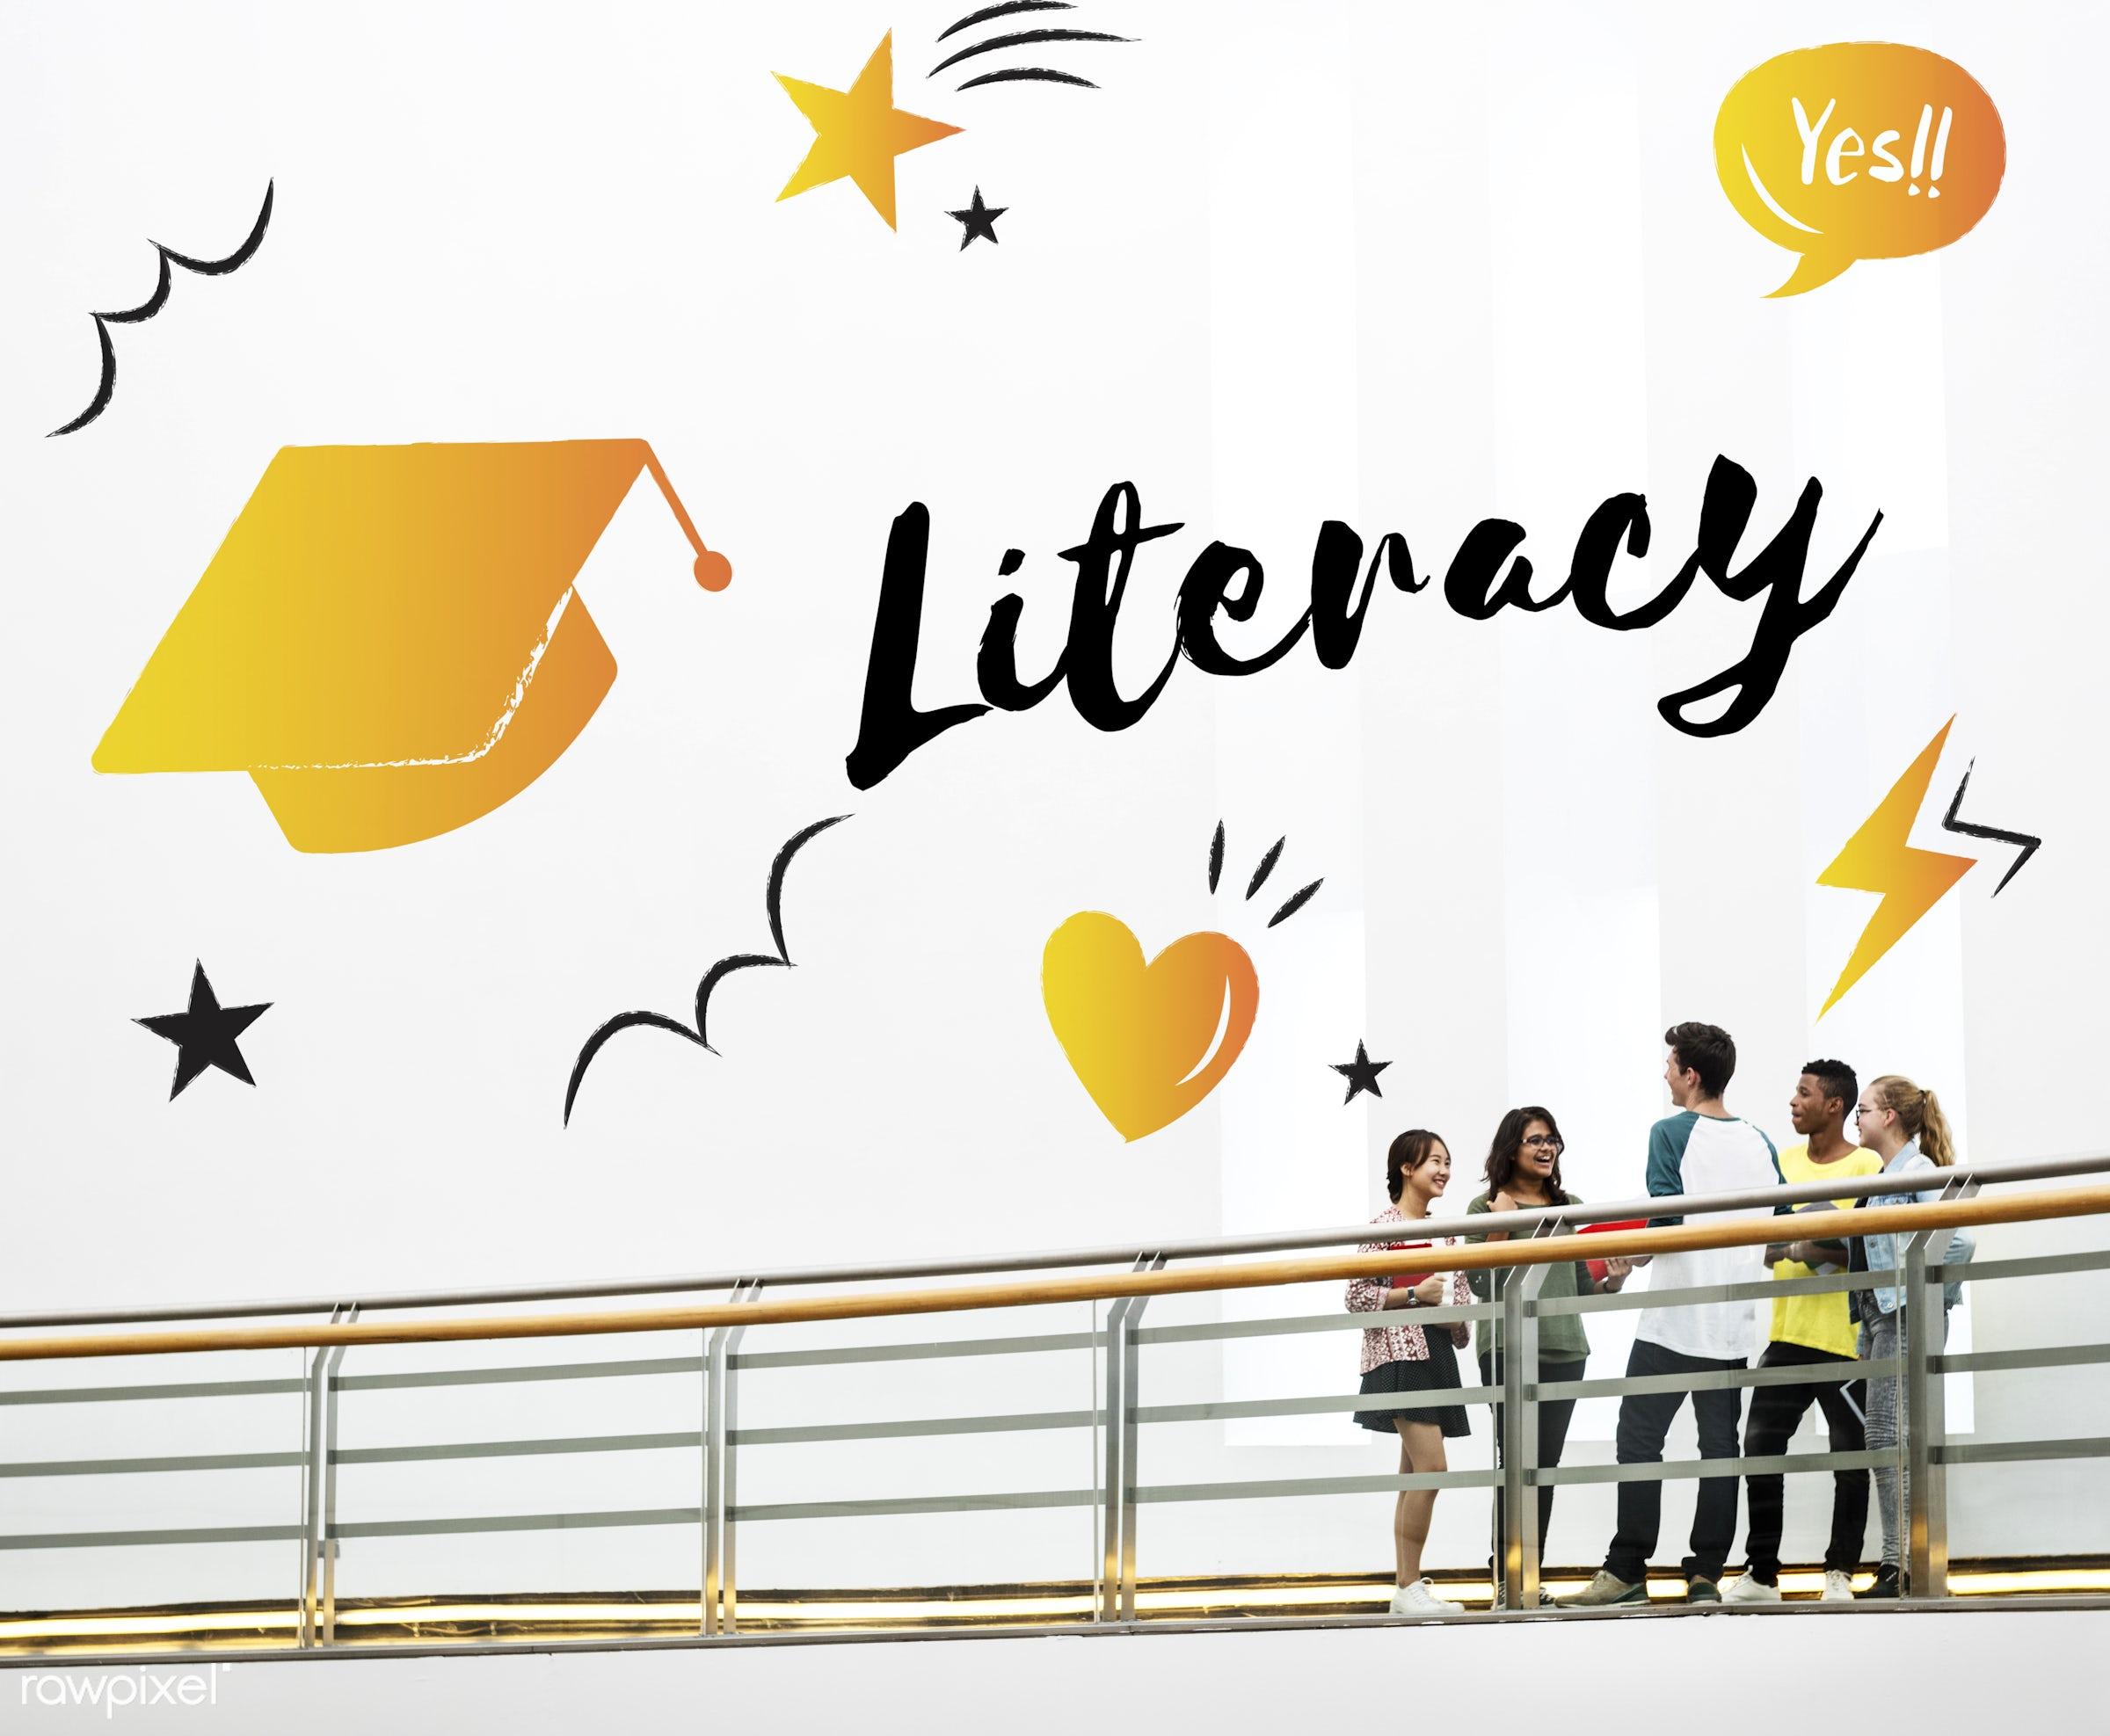 academics, book, books, boy, bridge, cap, carrying, education, friends, friendship, girls, graduation, graphic, group of...